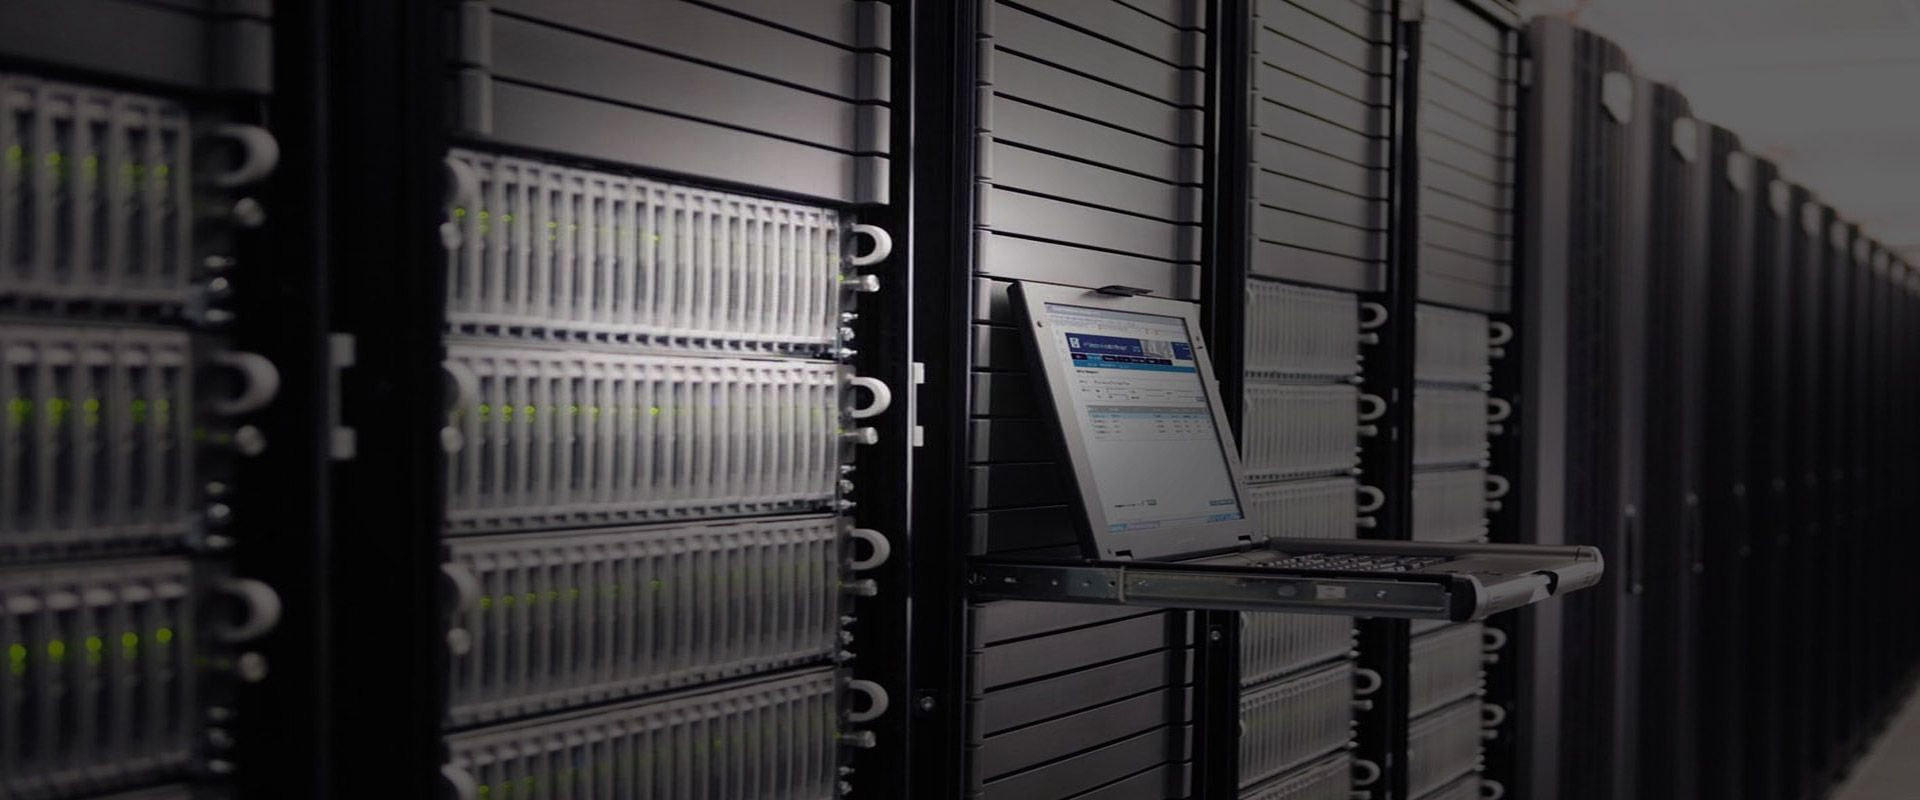 Dedicated Linux Server